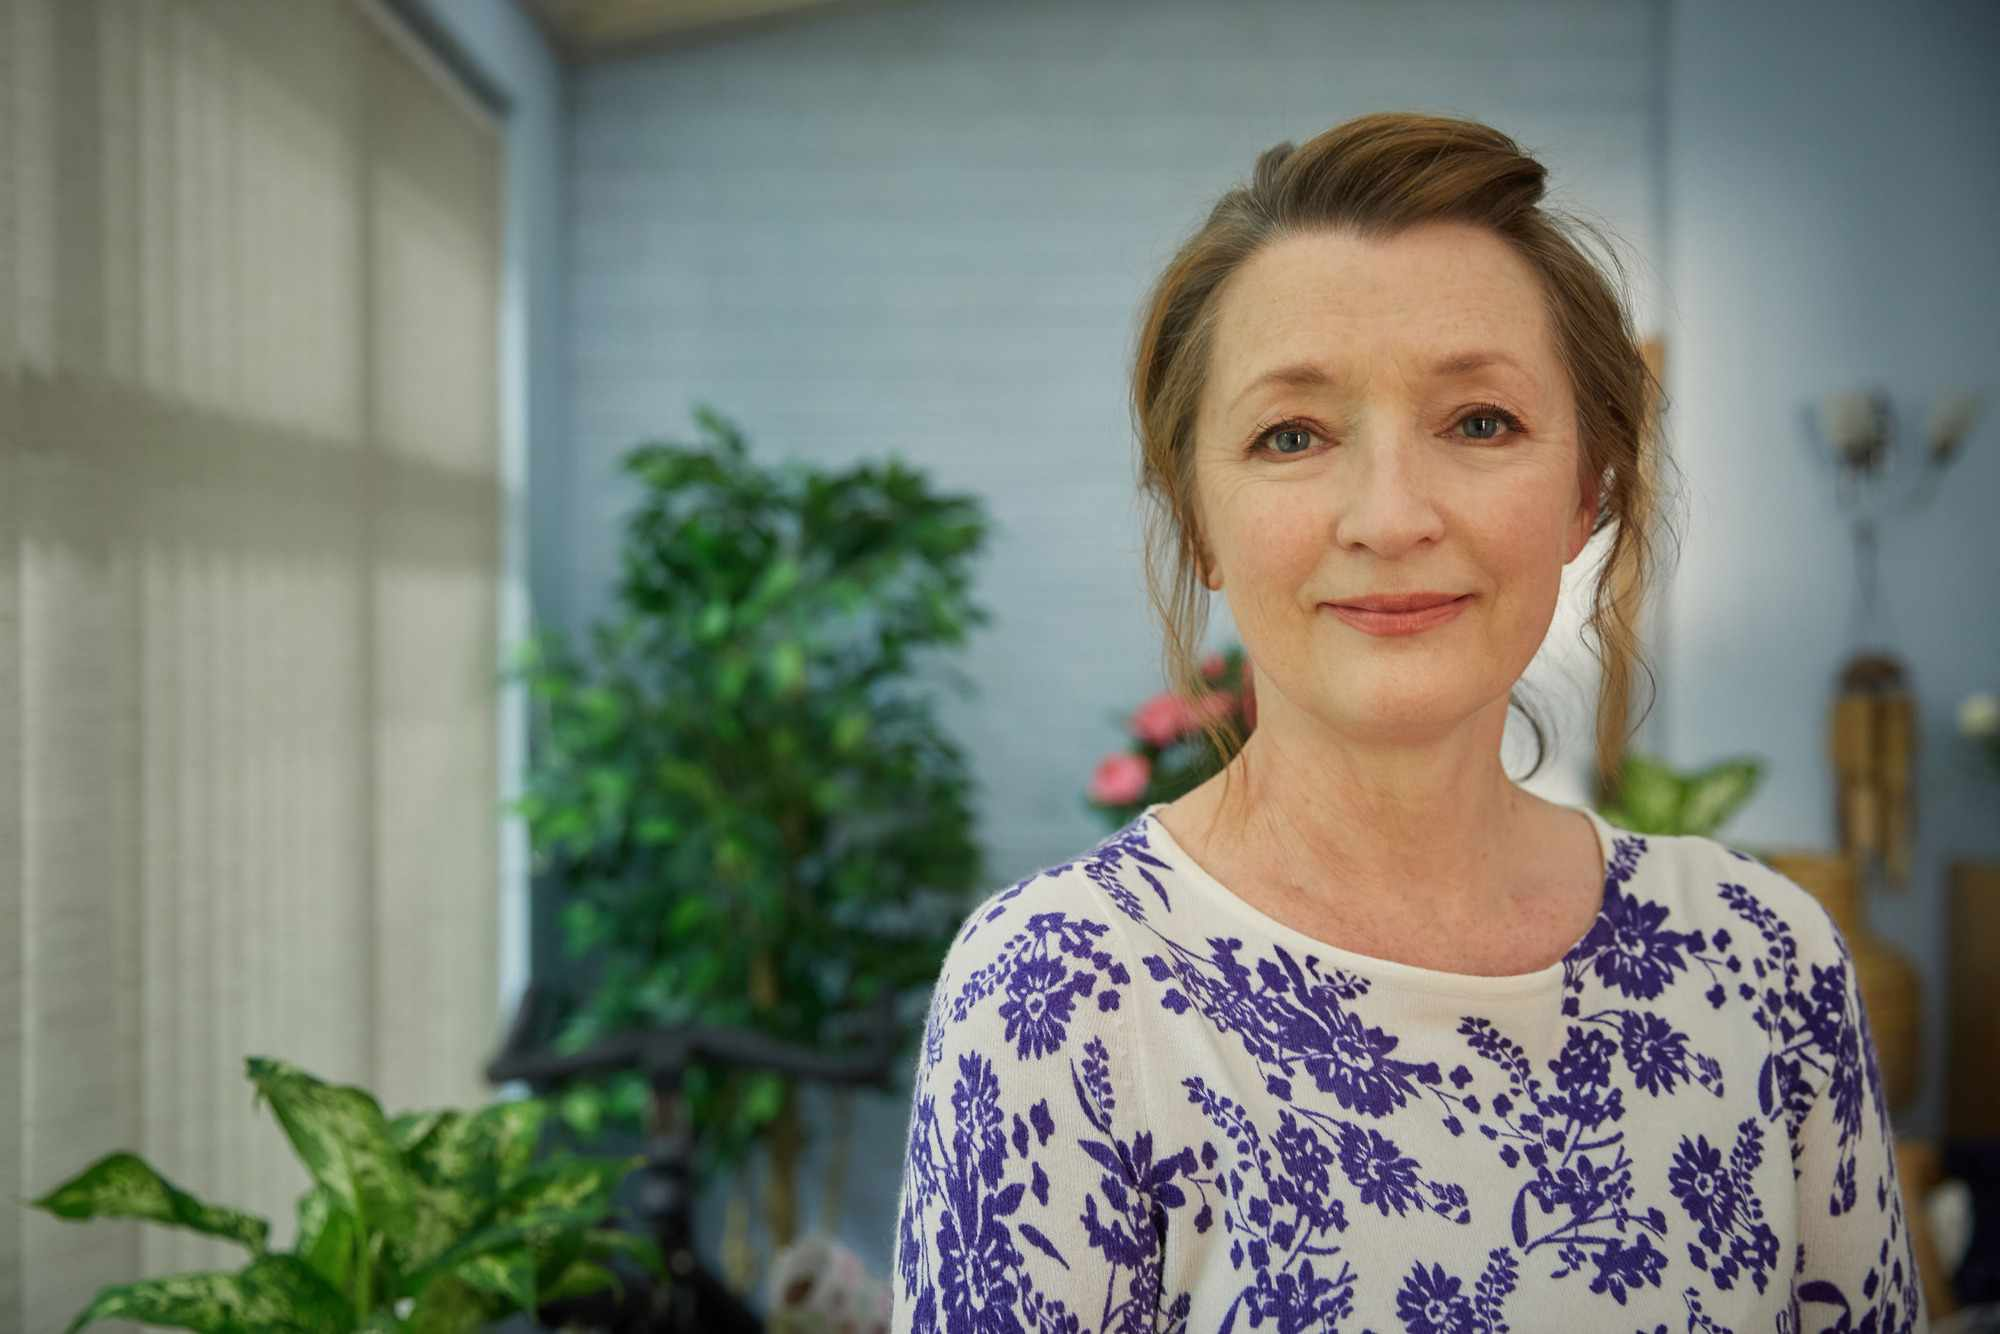 Cathy (LESLEY MANVILLE) in BBC's Mum (BBC, JG)